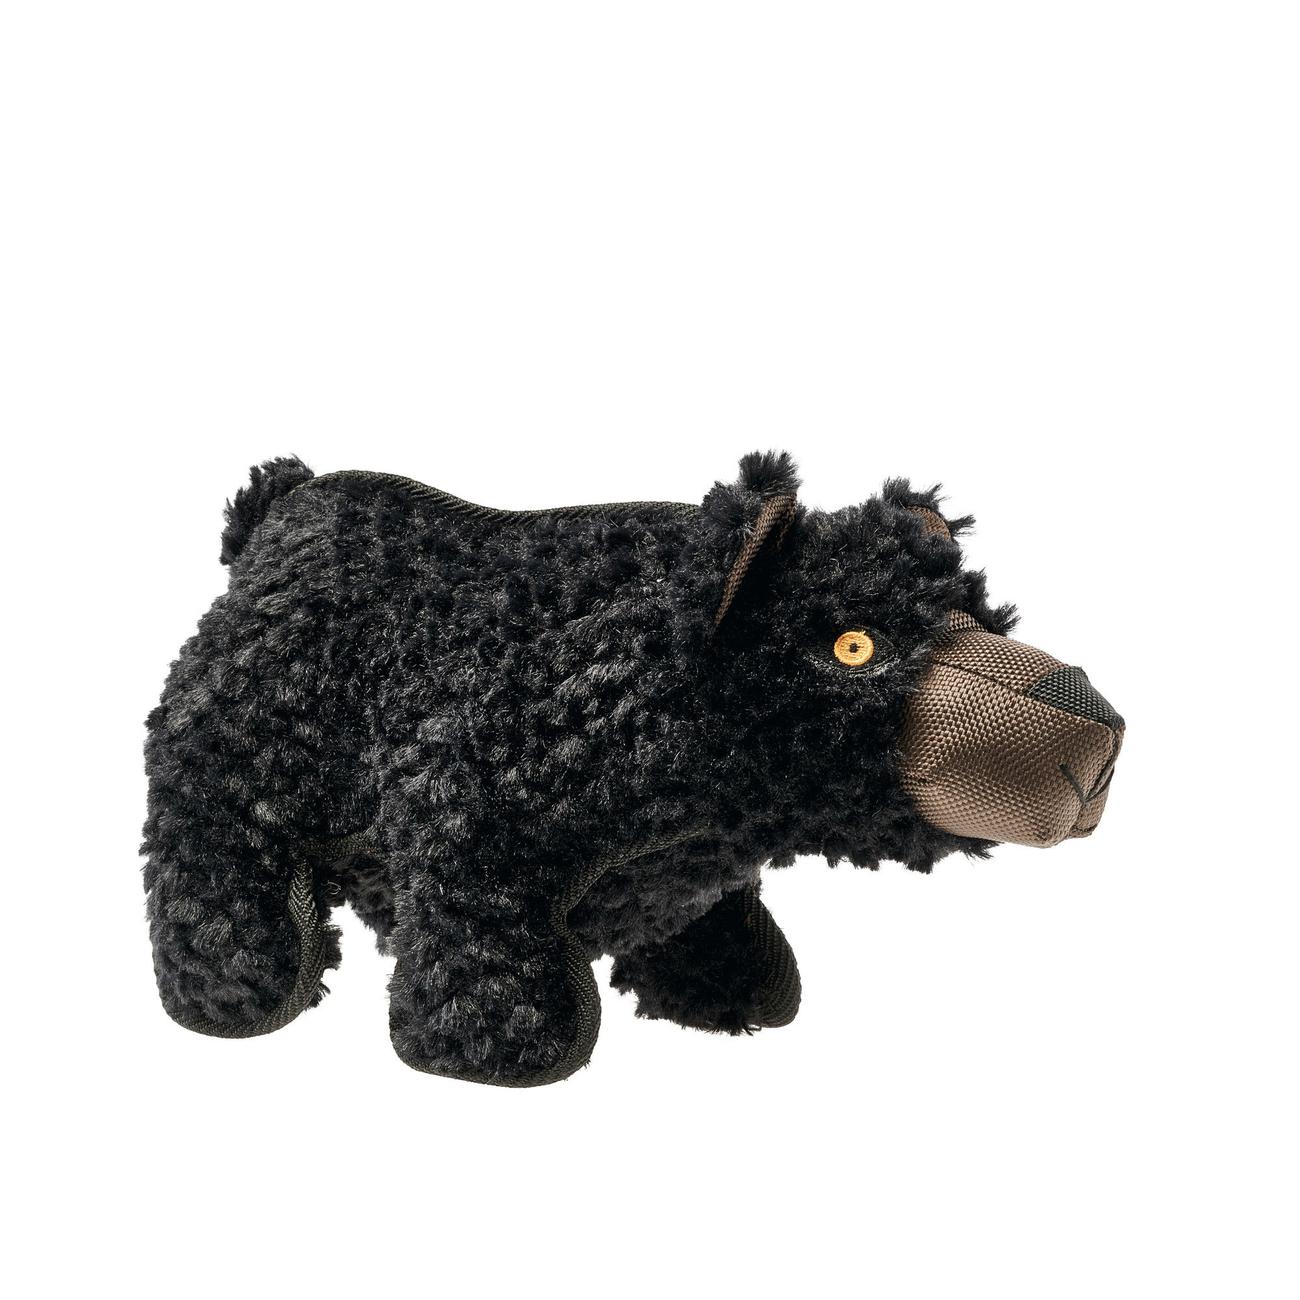 Hunter Hundespielzeug Tough Kamerun Stofftier, Bär, 29 cm